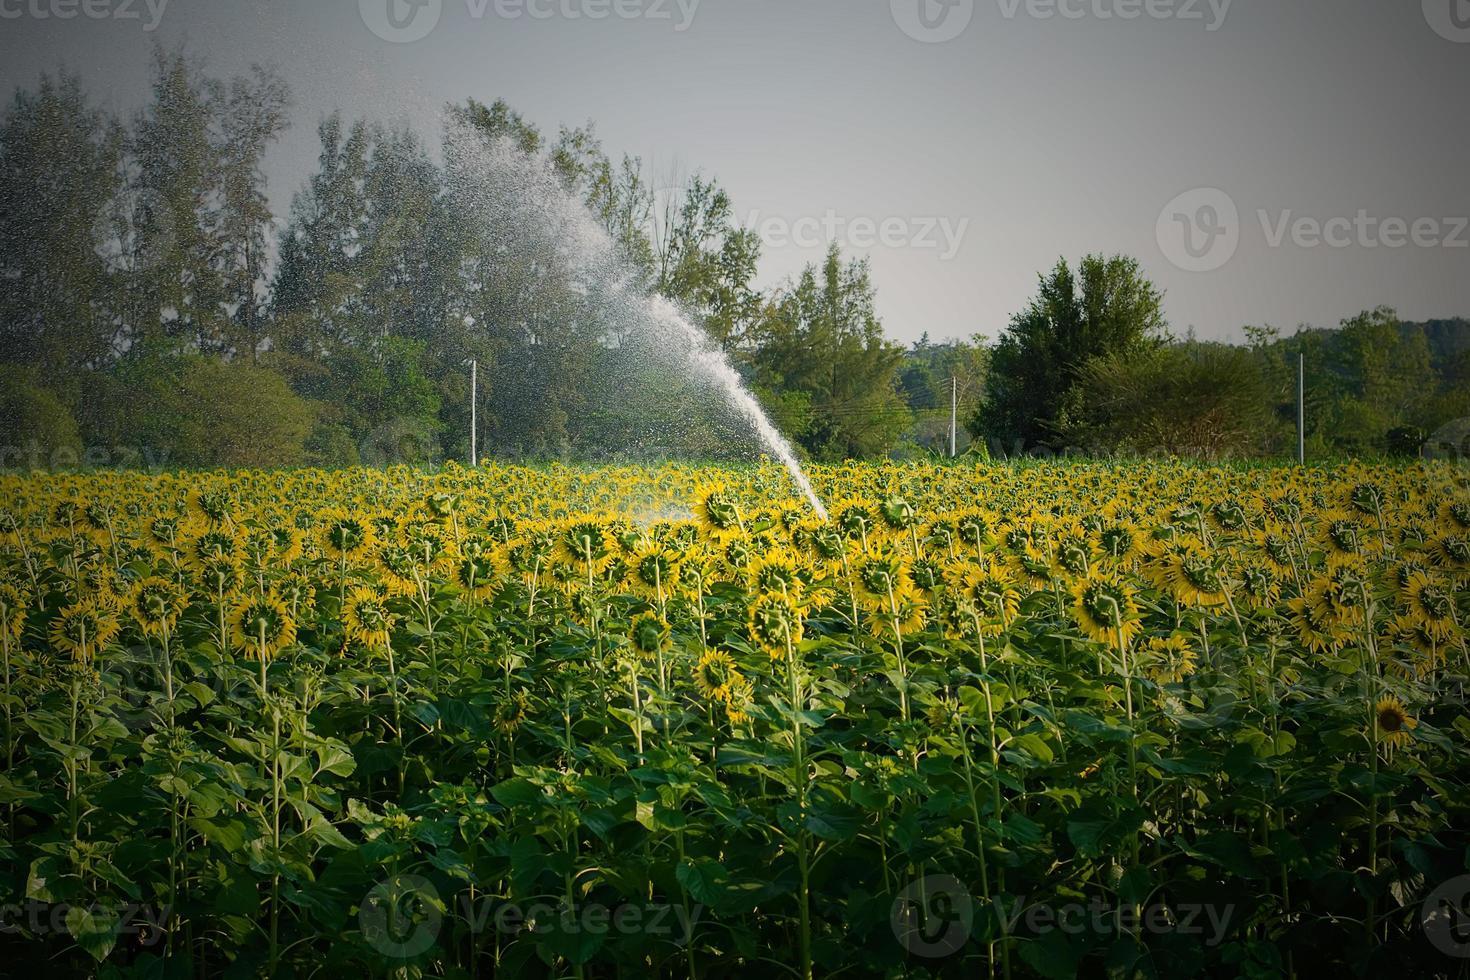 drenken zonnebloem veld foto